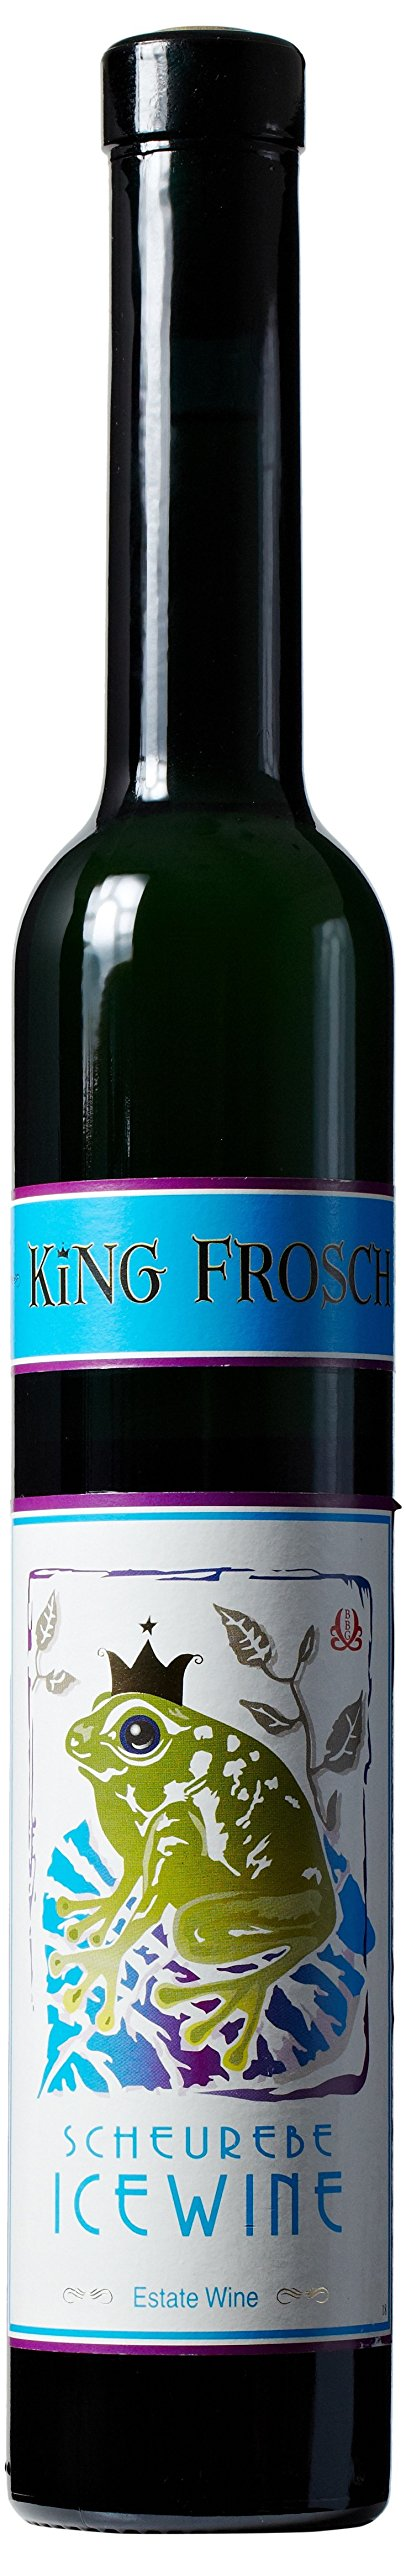 2005 King Frosch Scheurebe Eiswein 375 mL All Natural German Dessert Wine